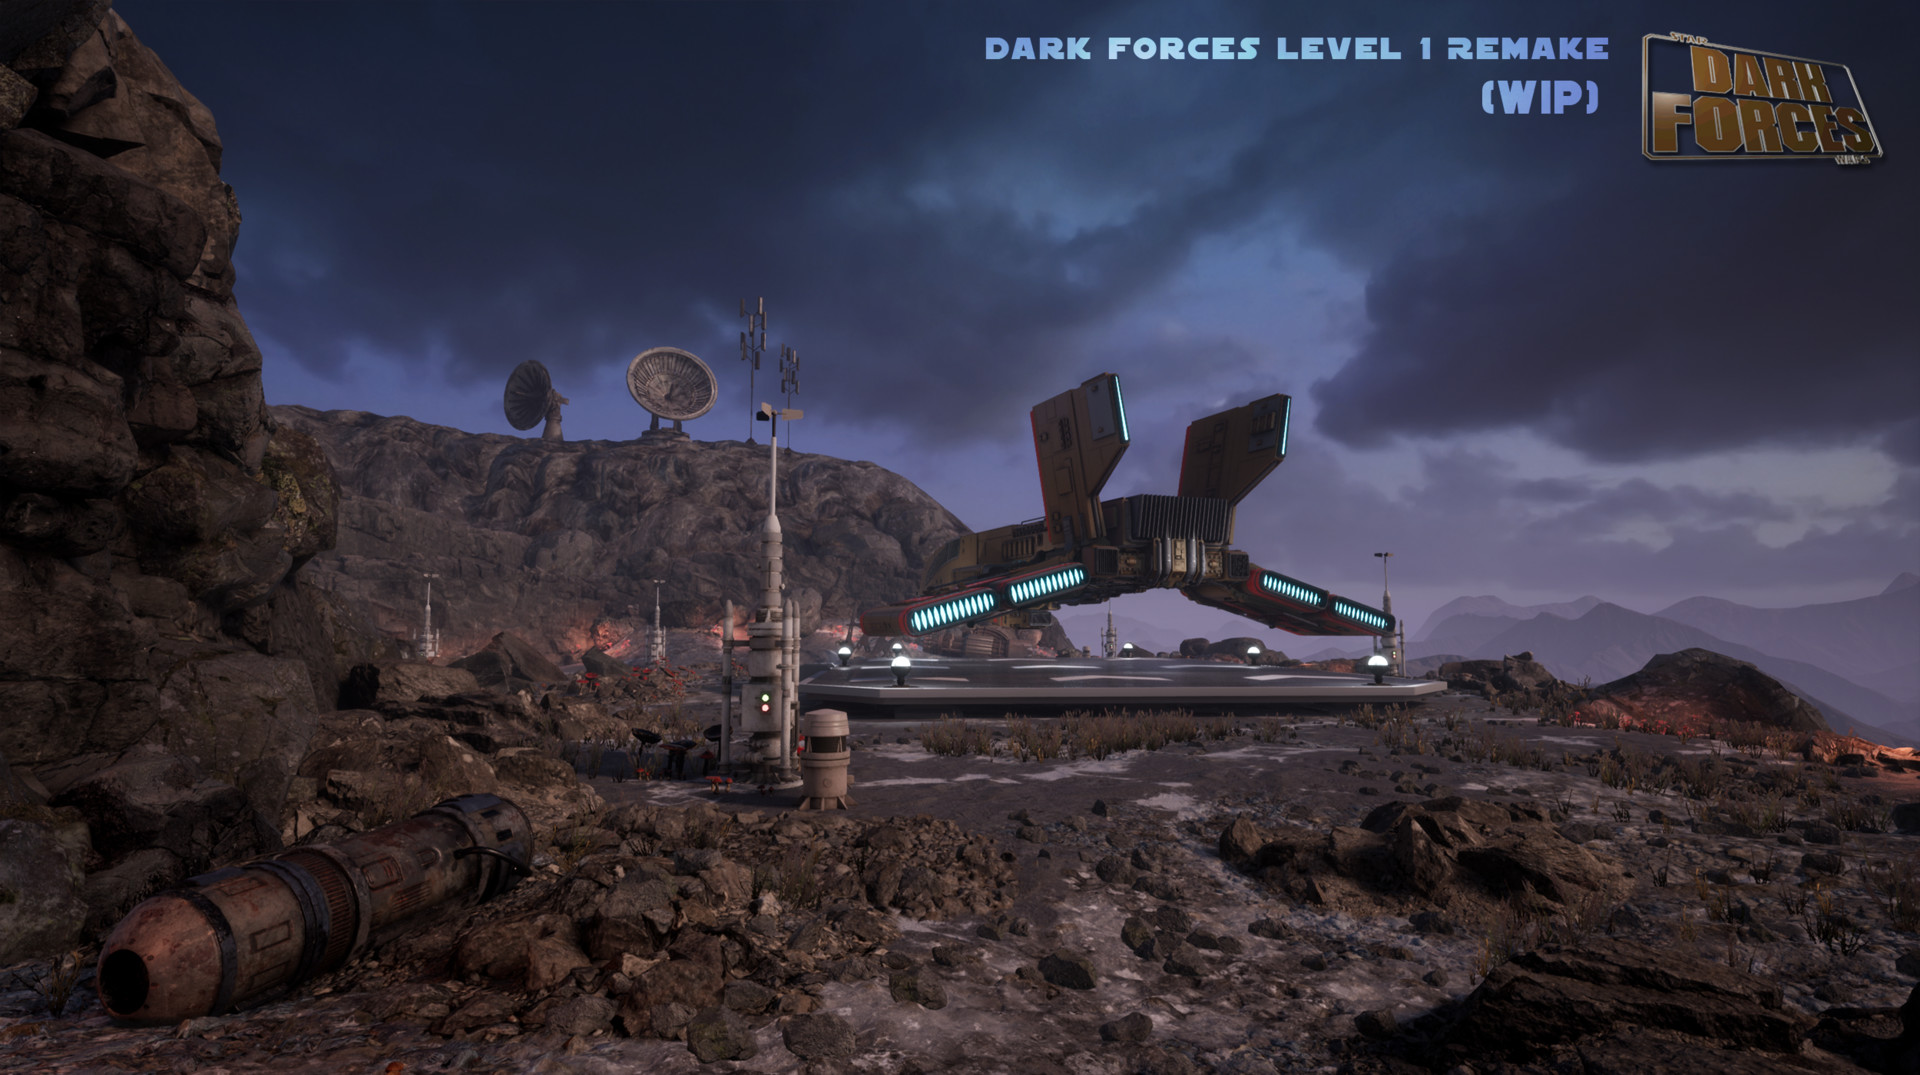 ArtStation - Dark Forces Remake - Phase 4, Jason Lewis